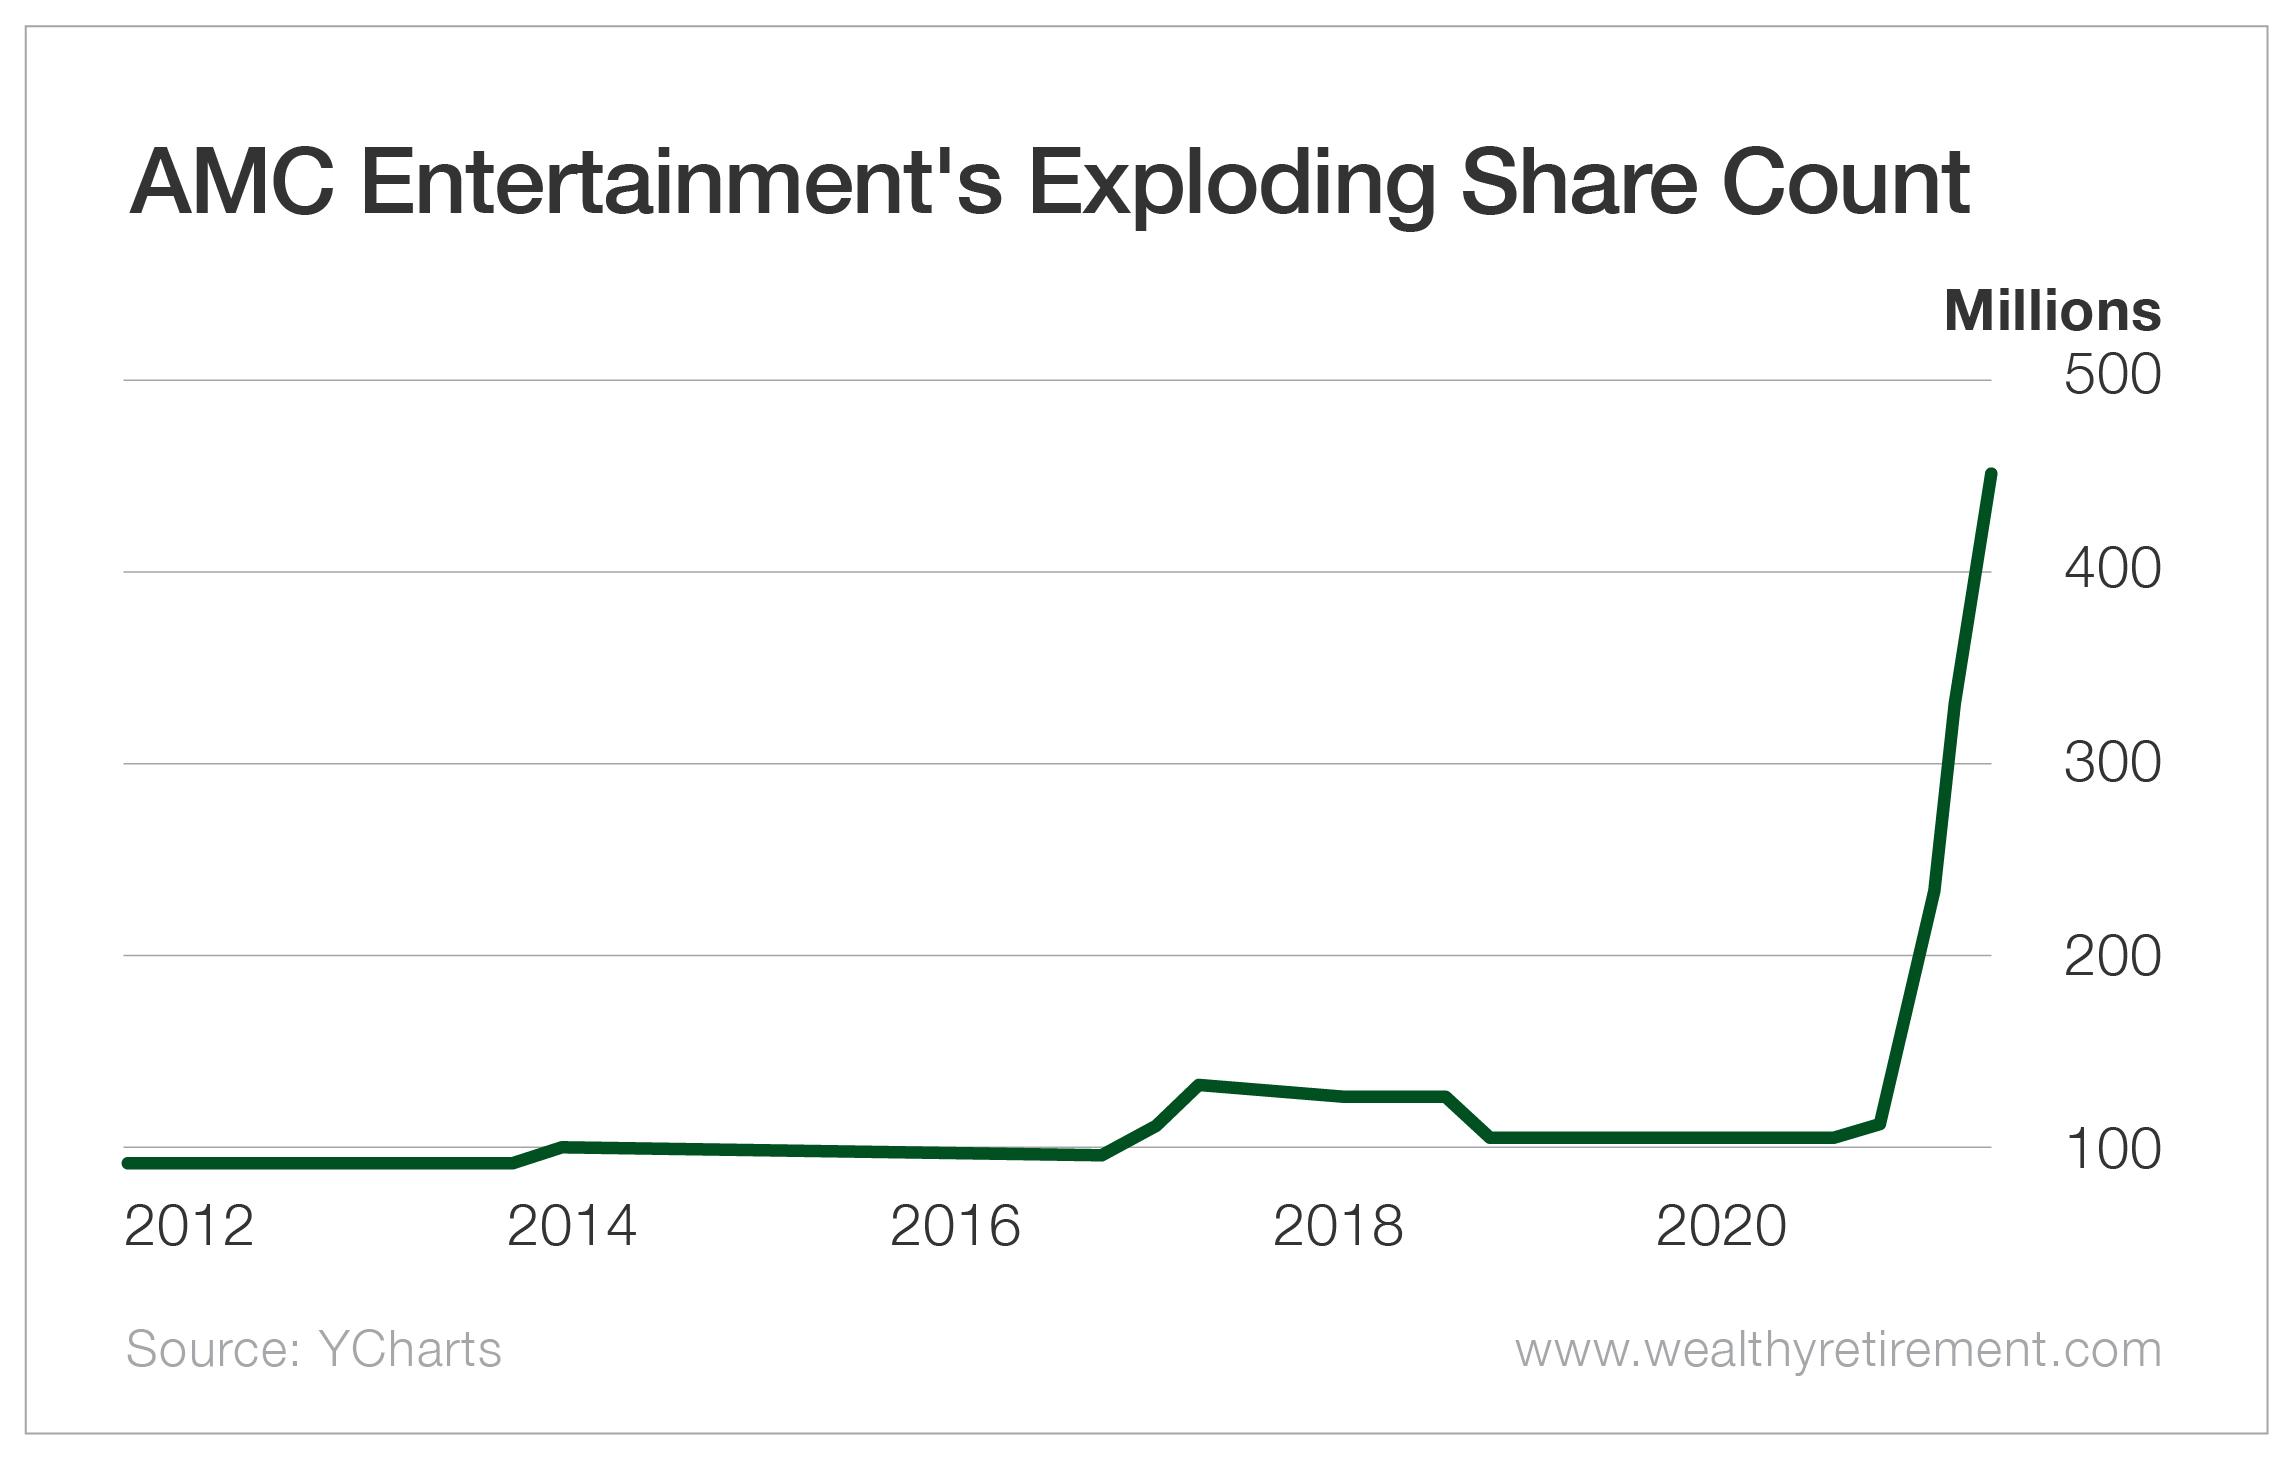 AMC Entertainment's Exploding Share Count